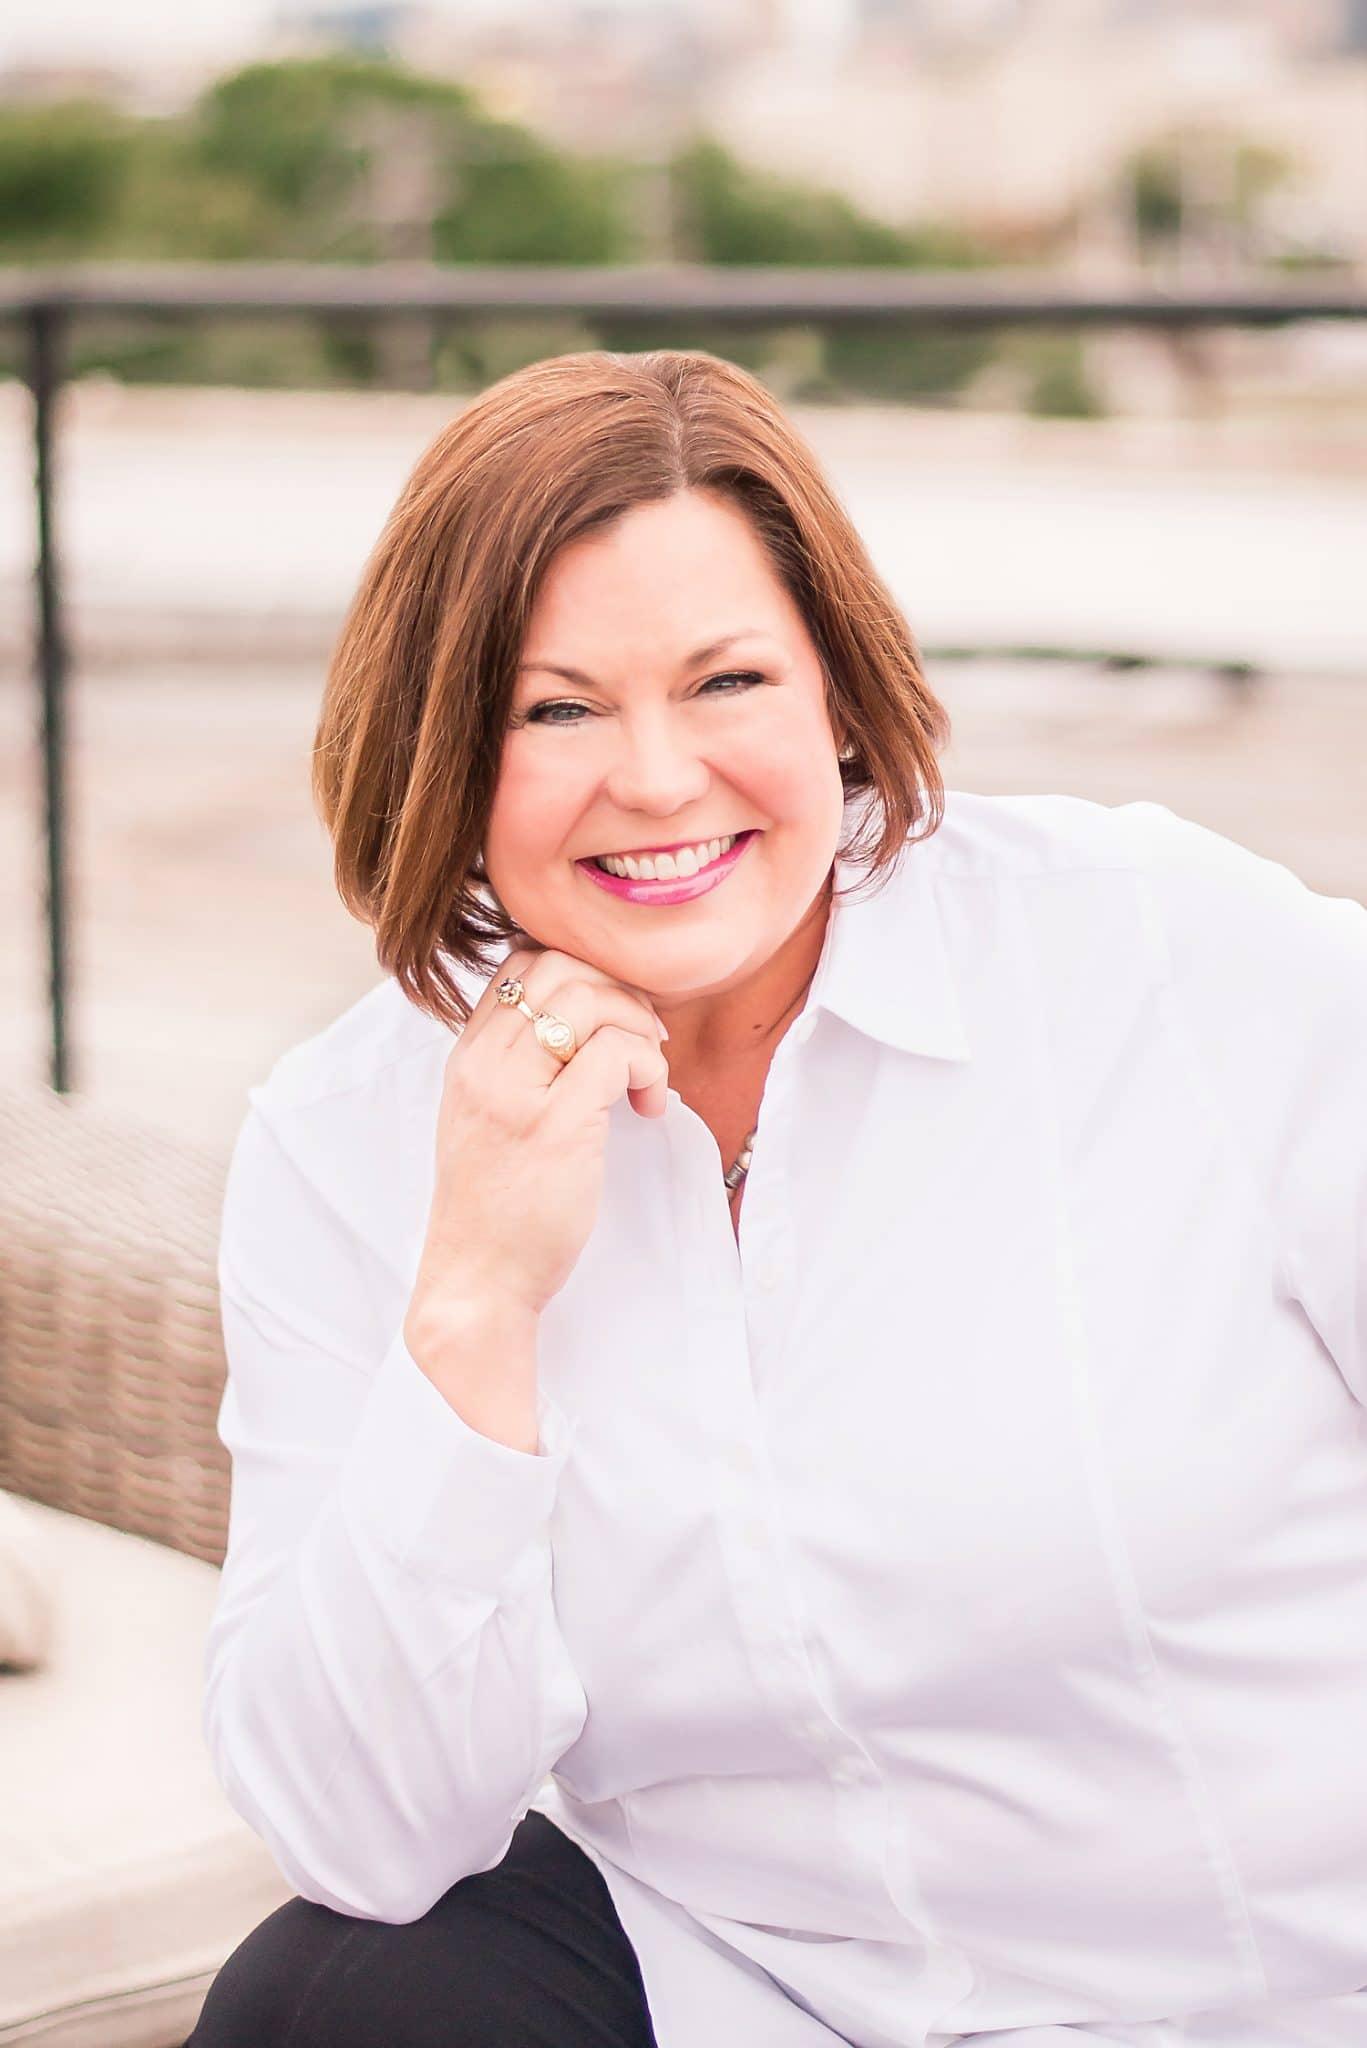 Susan Fennema Beyond the Chaos